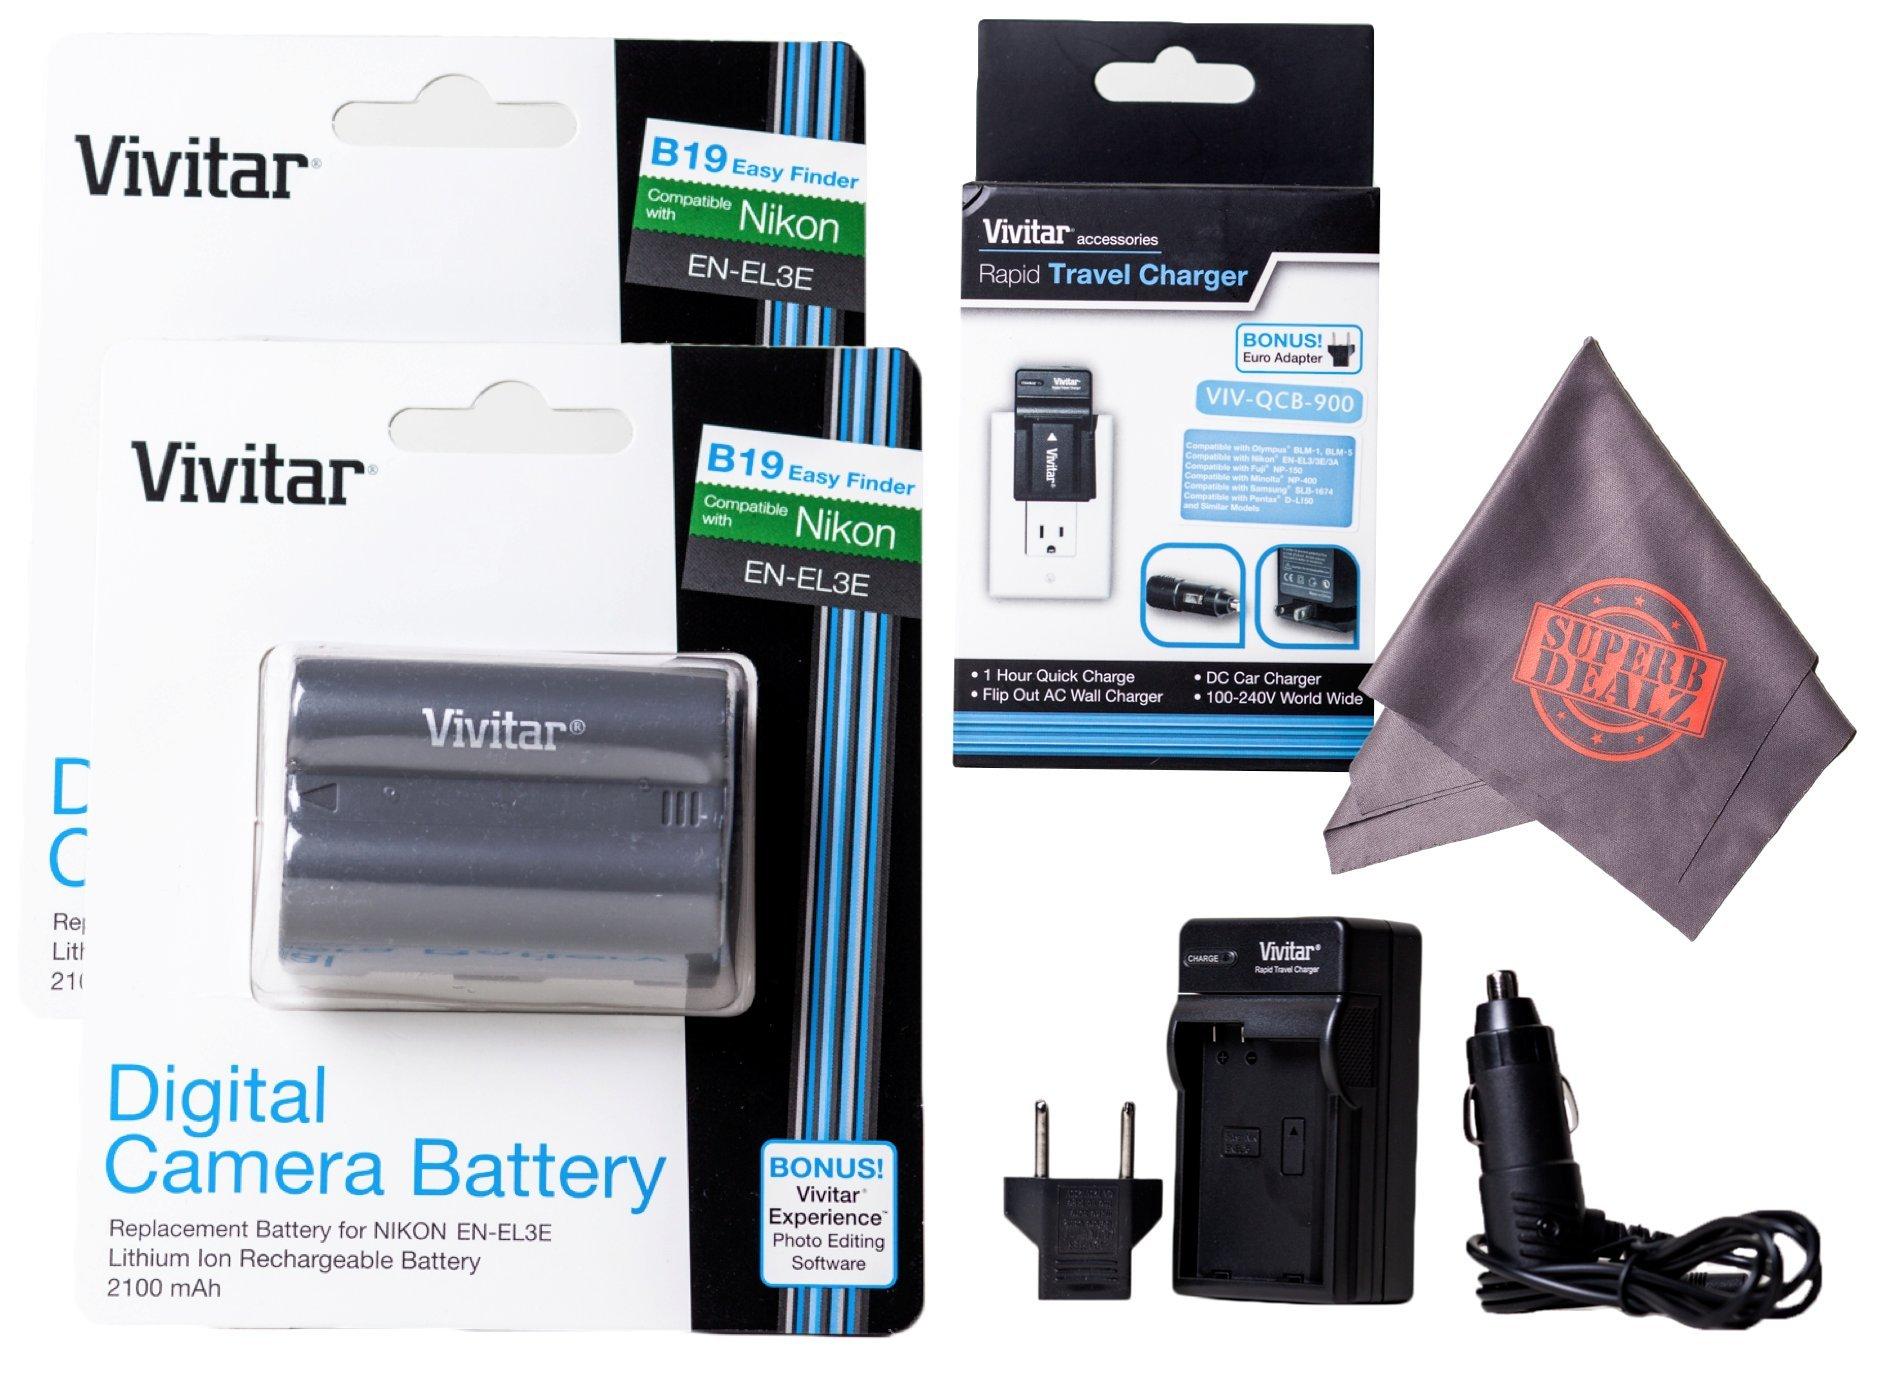 2 Pack of EN-EL3E Vivitar Ultra High Capacity Rechargeable 1900mAh Li-ion Batteries + AC/DC Vivitar Rapid Travel Charger + Microfiber Lens Cleaning Cloth ENEL3E EL3E (Nikon EN-EL3E Replacement) by Vivitar